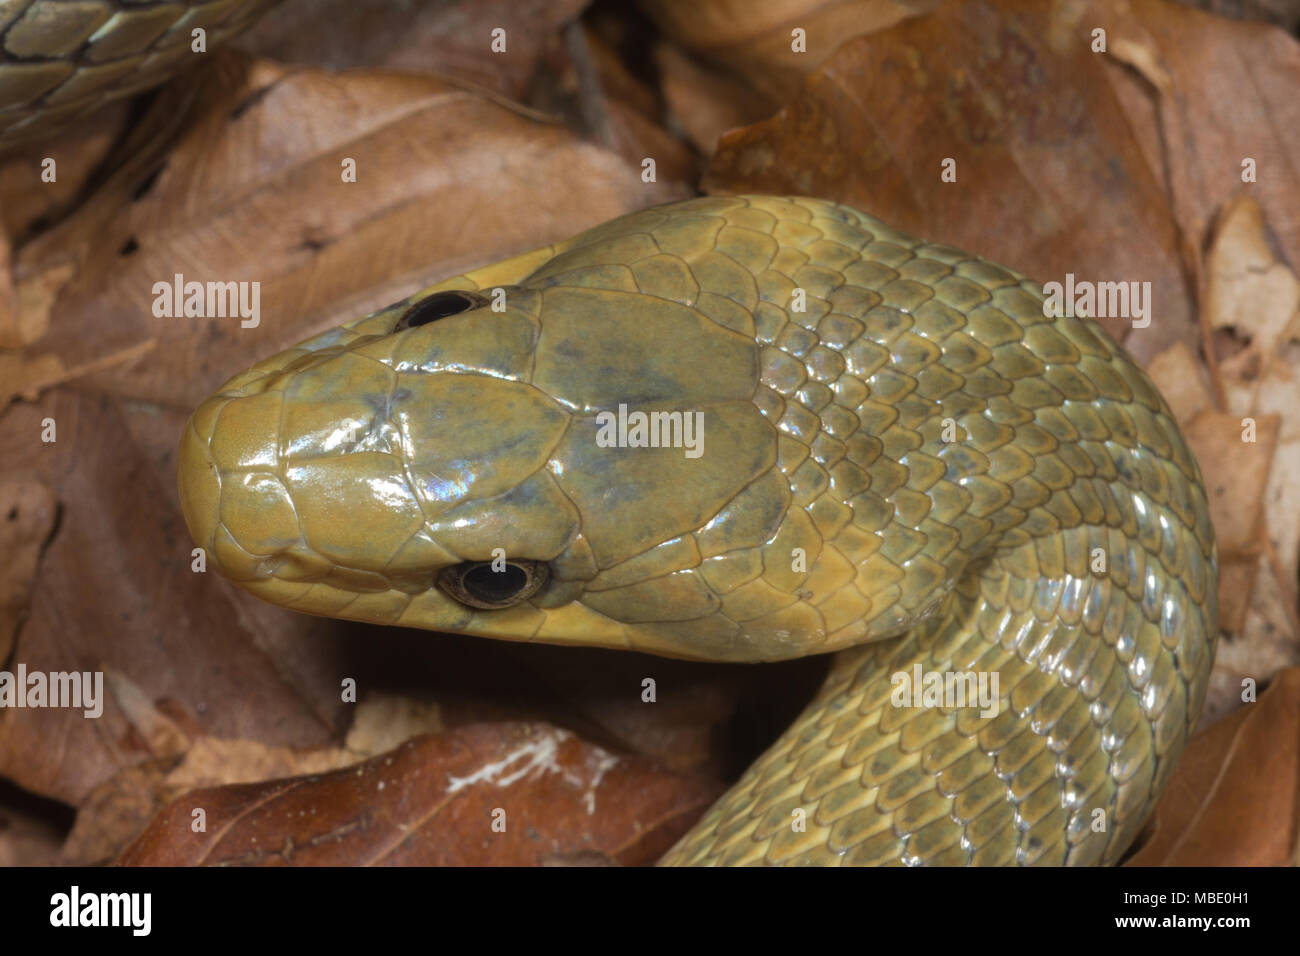 Overhead view of the head of an Aesculapian snake (Zamenis longissimus) near Lake Molveno, Italy - Stock Image